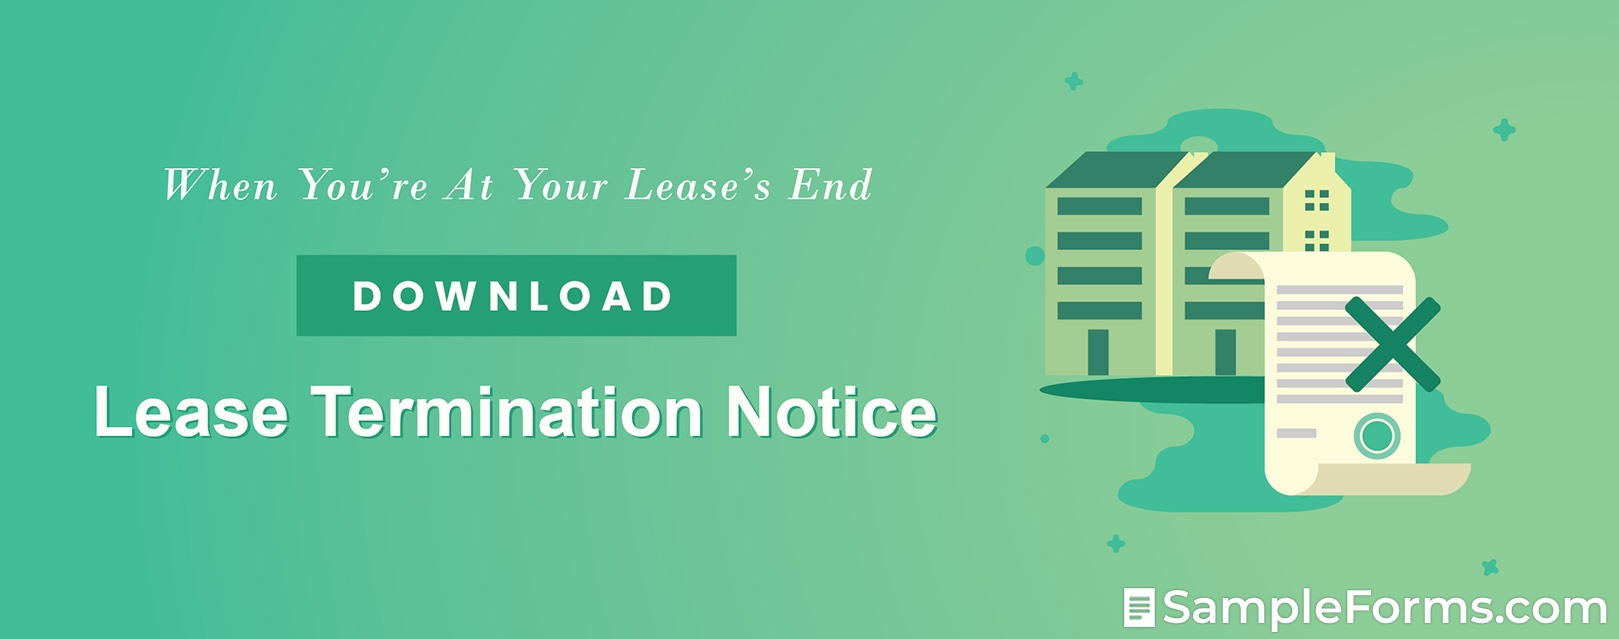 Lease Termination Notice